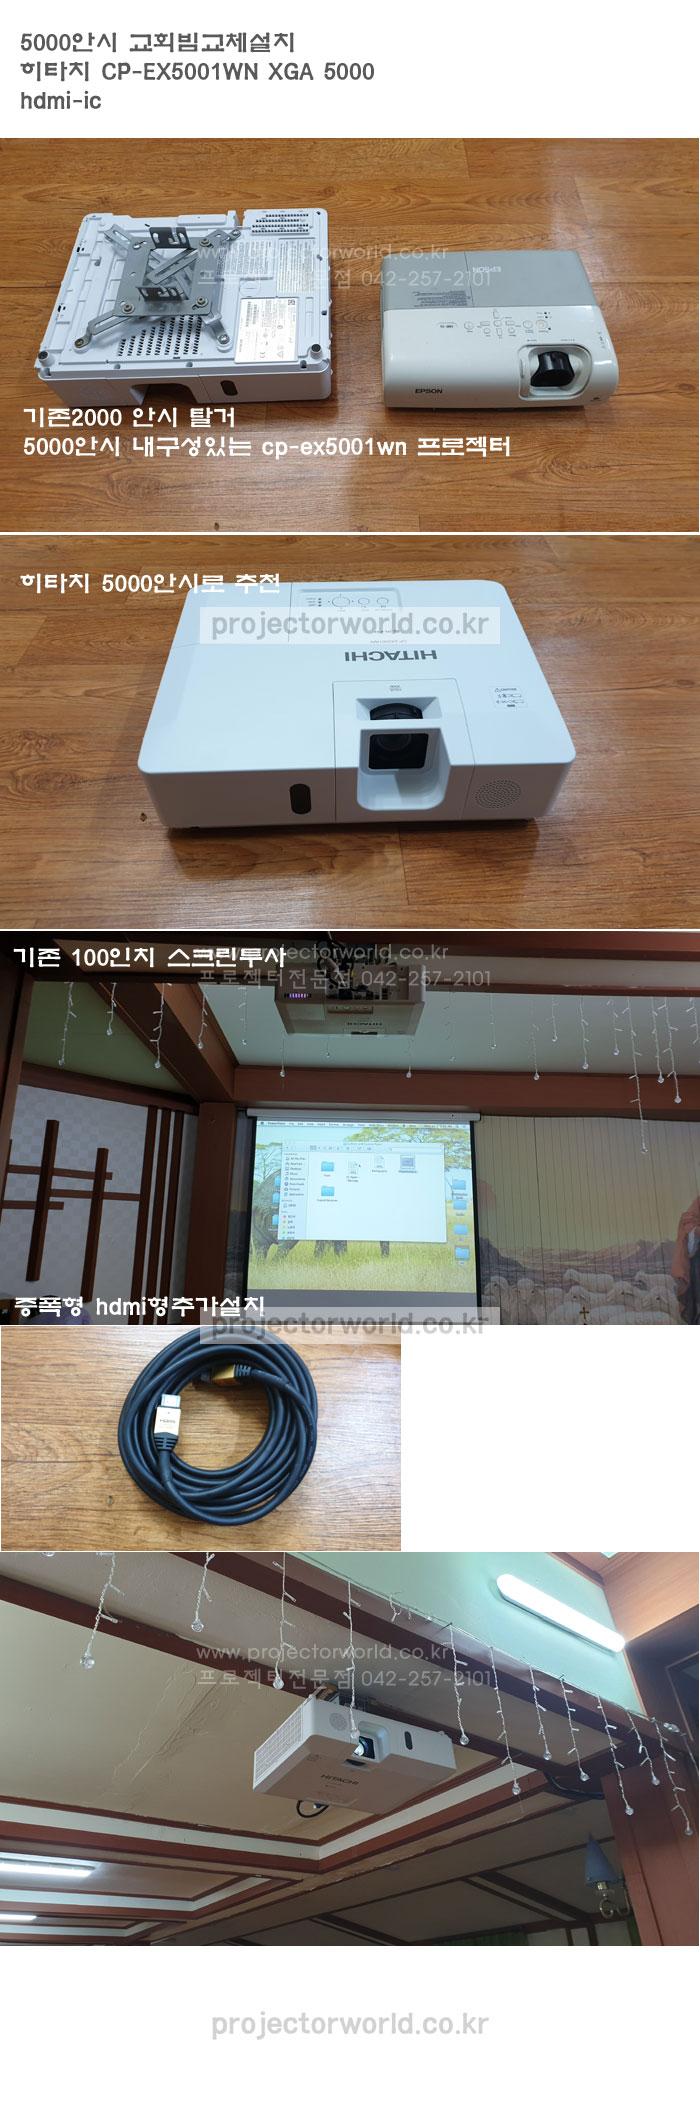 cp-ex5001,부여프로젝터빔설치,대전프로젝터전문판매,히타치빔프로,